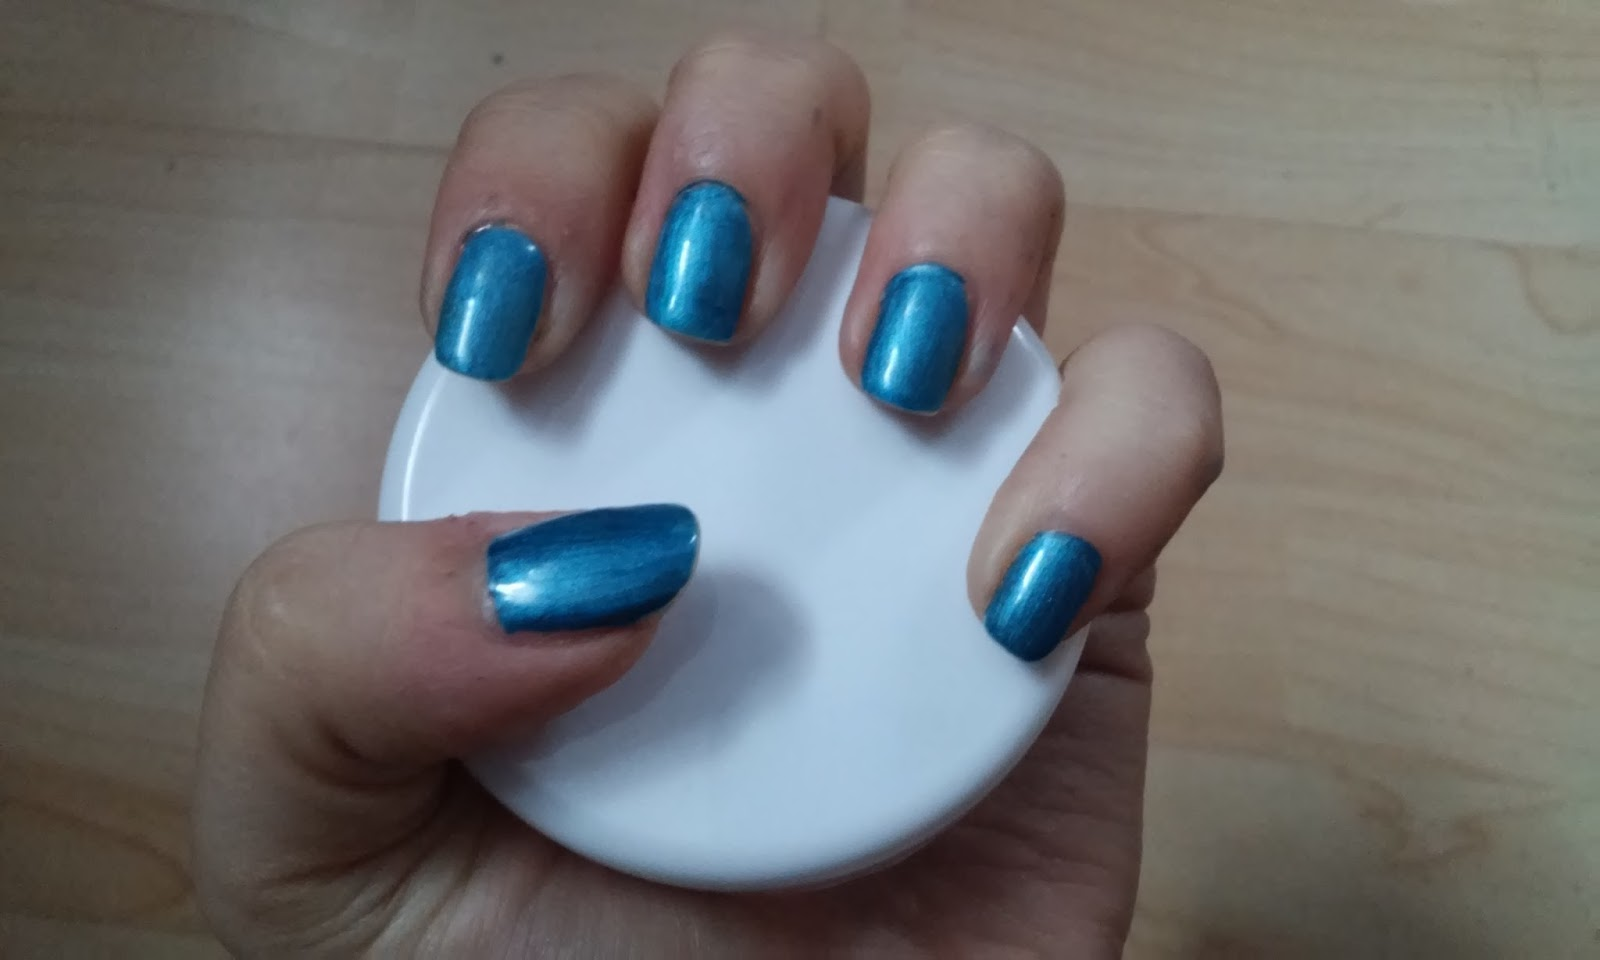 NeoNails UV Gel Polish 3756-1